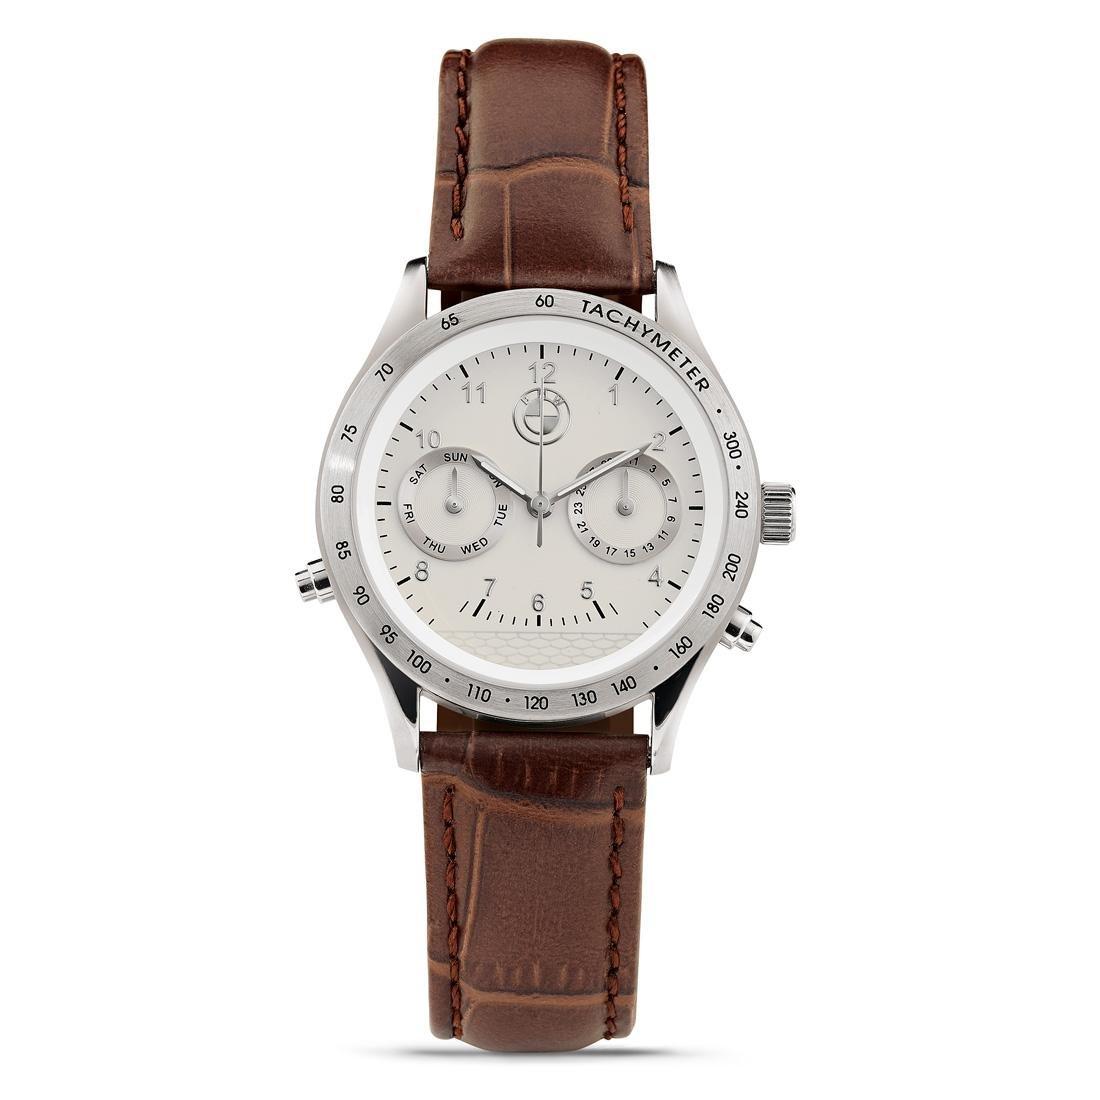 BMW Armbanduhr Day Date - Damen